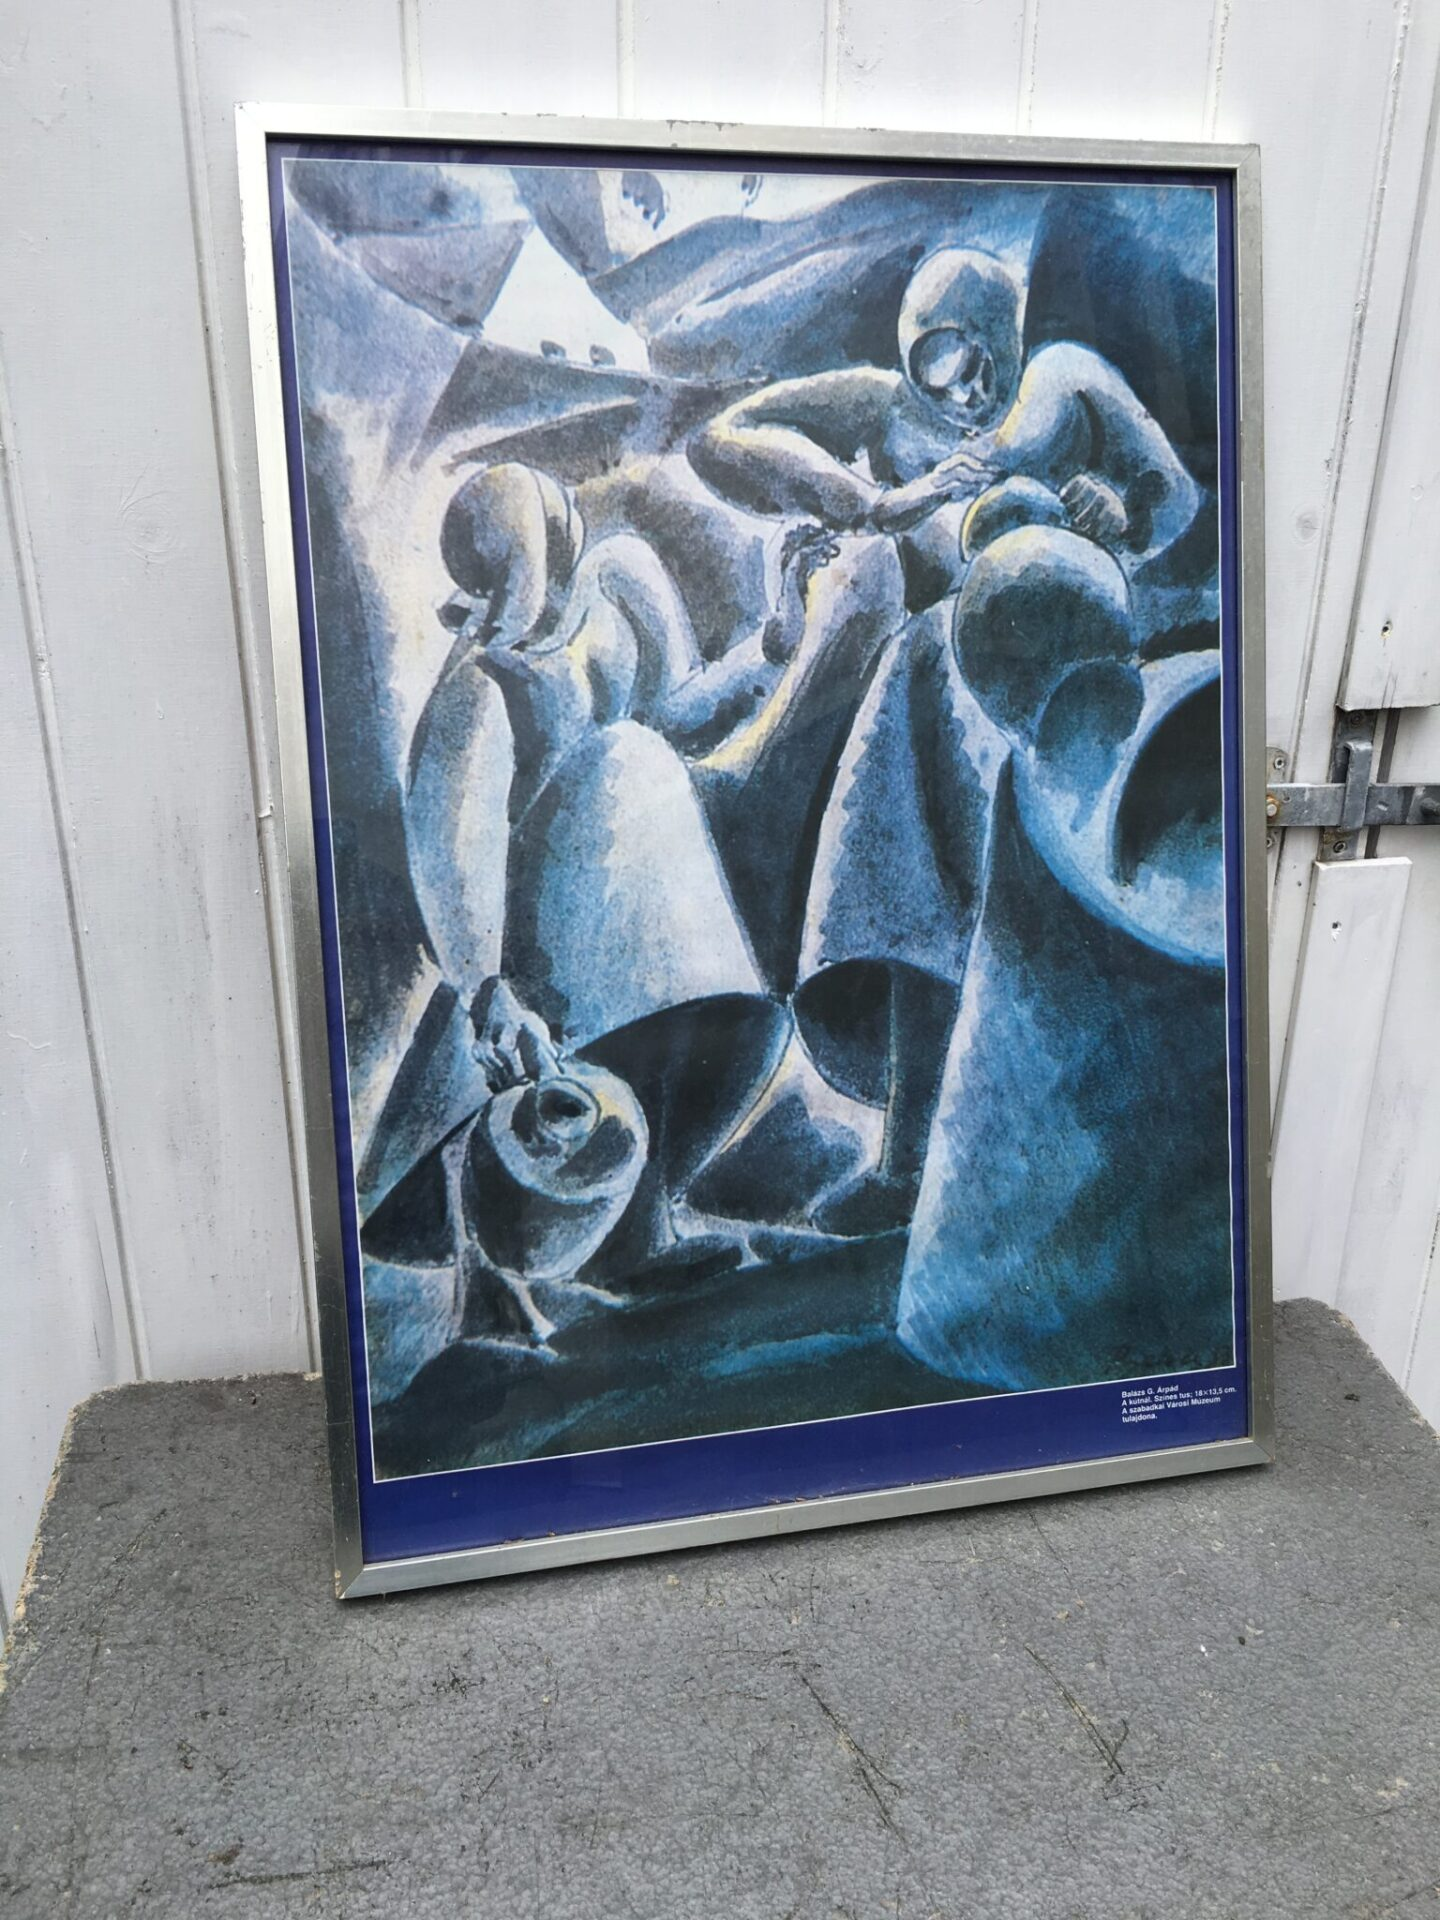 Offset tryk, Balazs G. Arpad (50x70 cm, incl ramme). Pris 300 kr